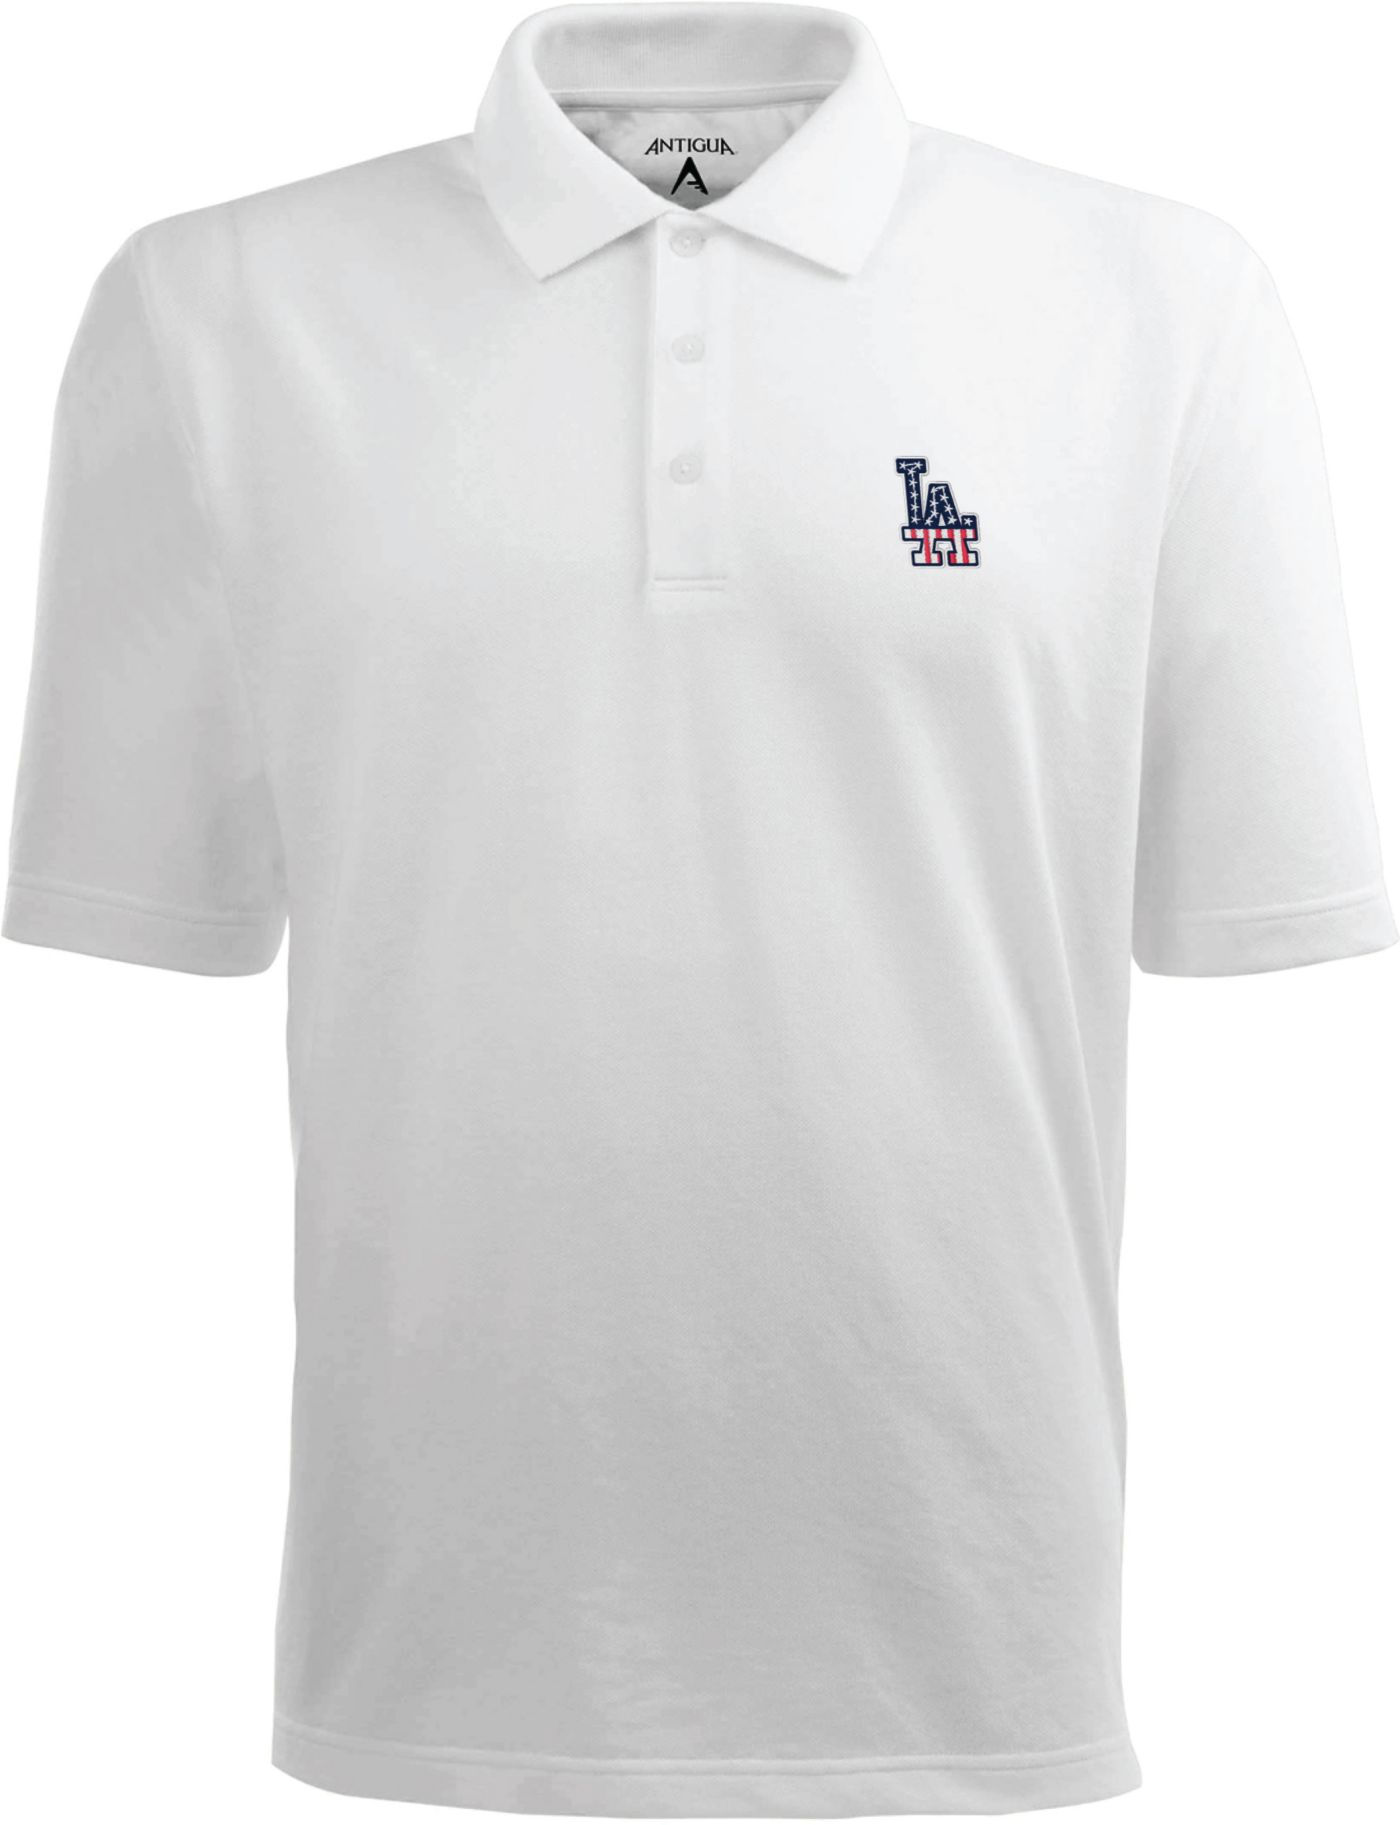 Antigua Men's Los Angeles Dodgers Xtra-Lite Patriotic Logo White Pique Performance Polo